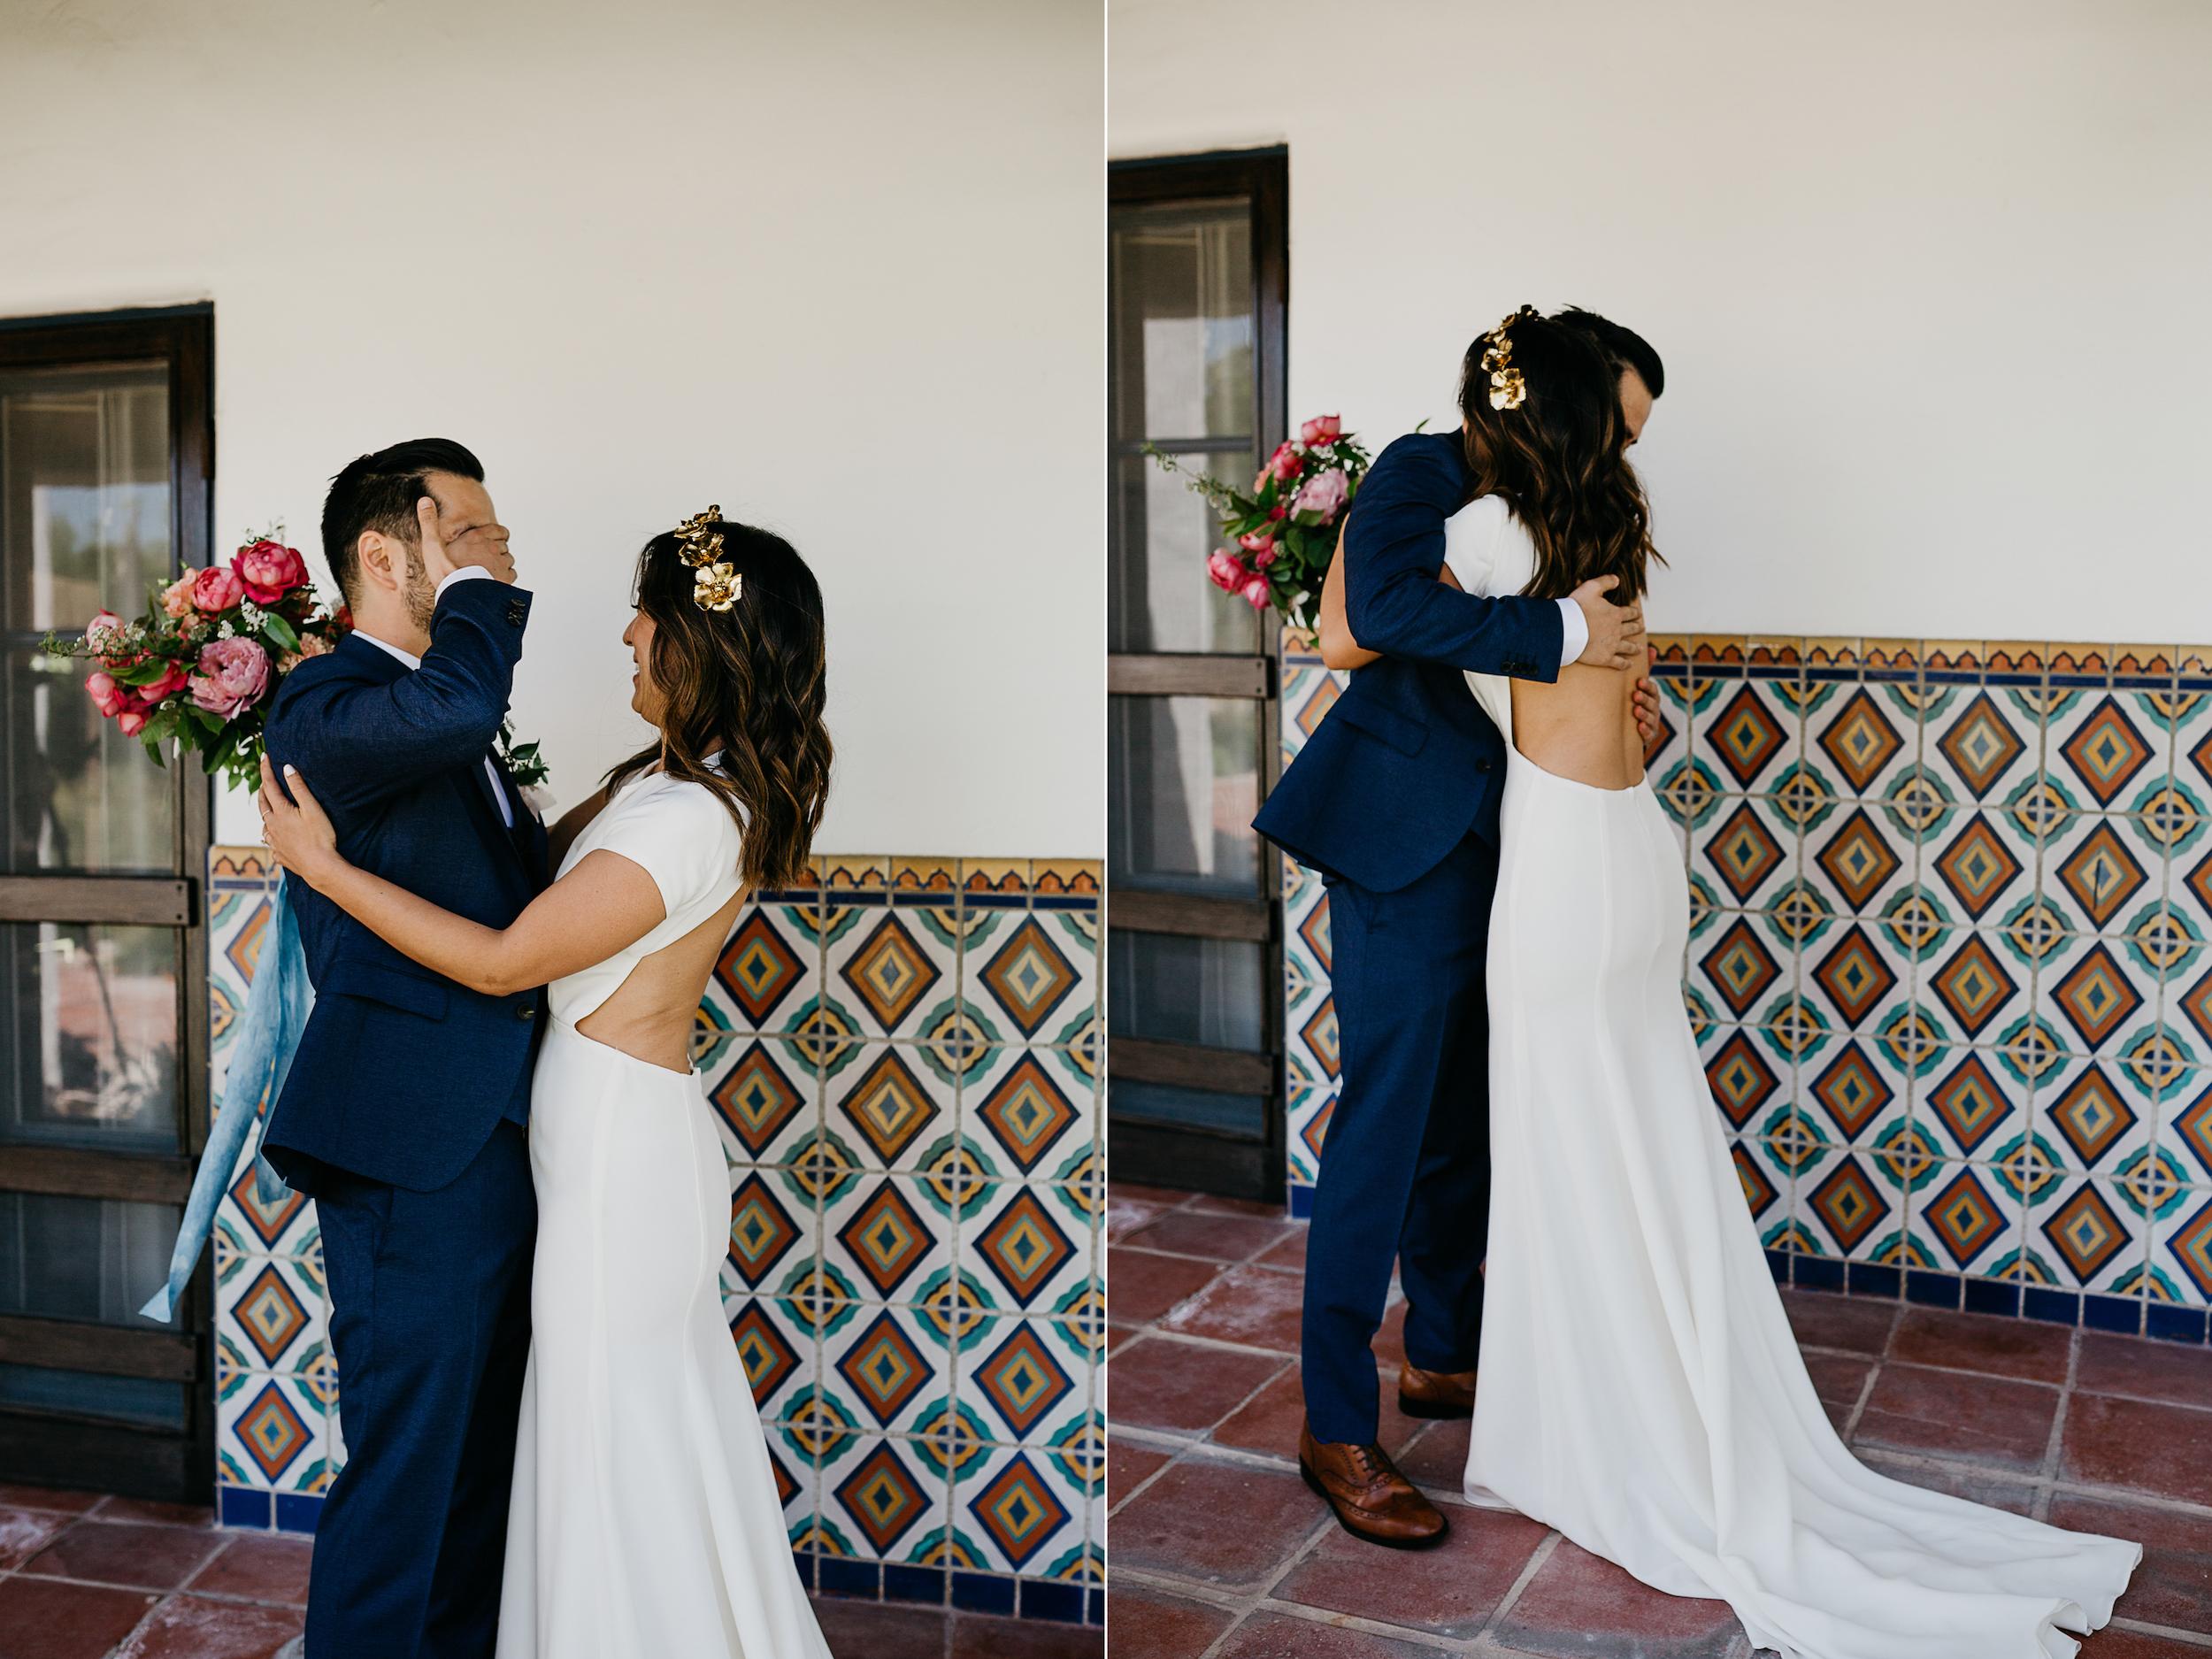 palm-springs-wedding-photographer 013.jpg